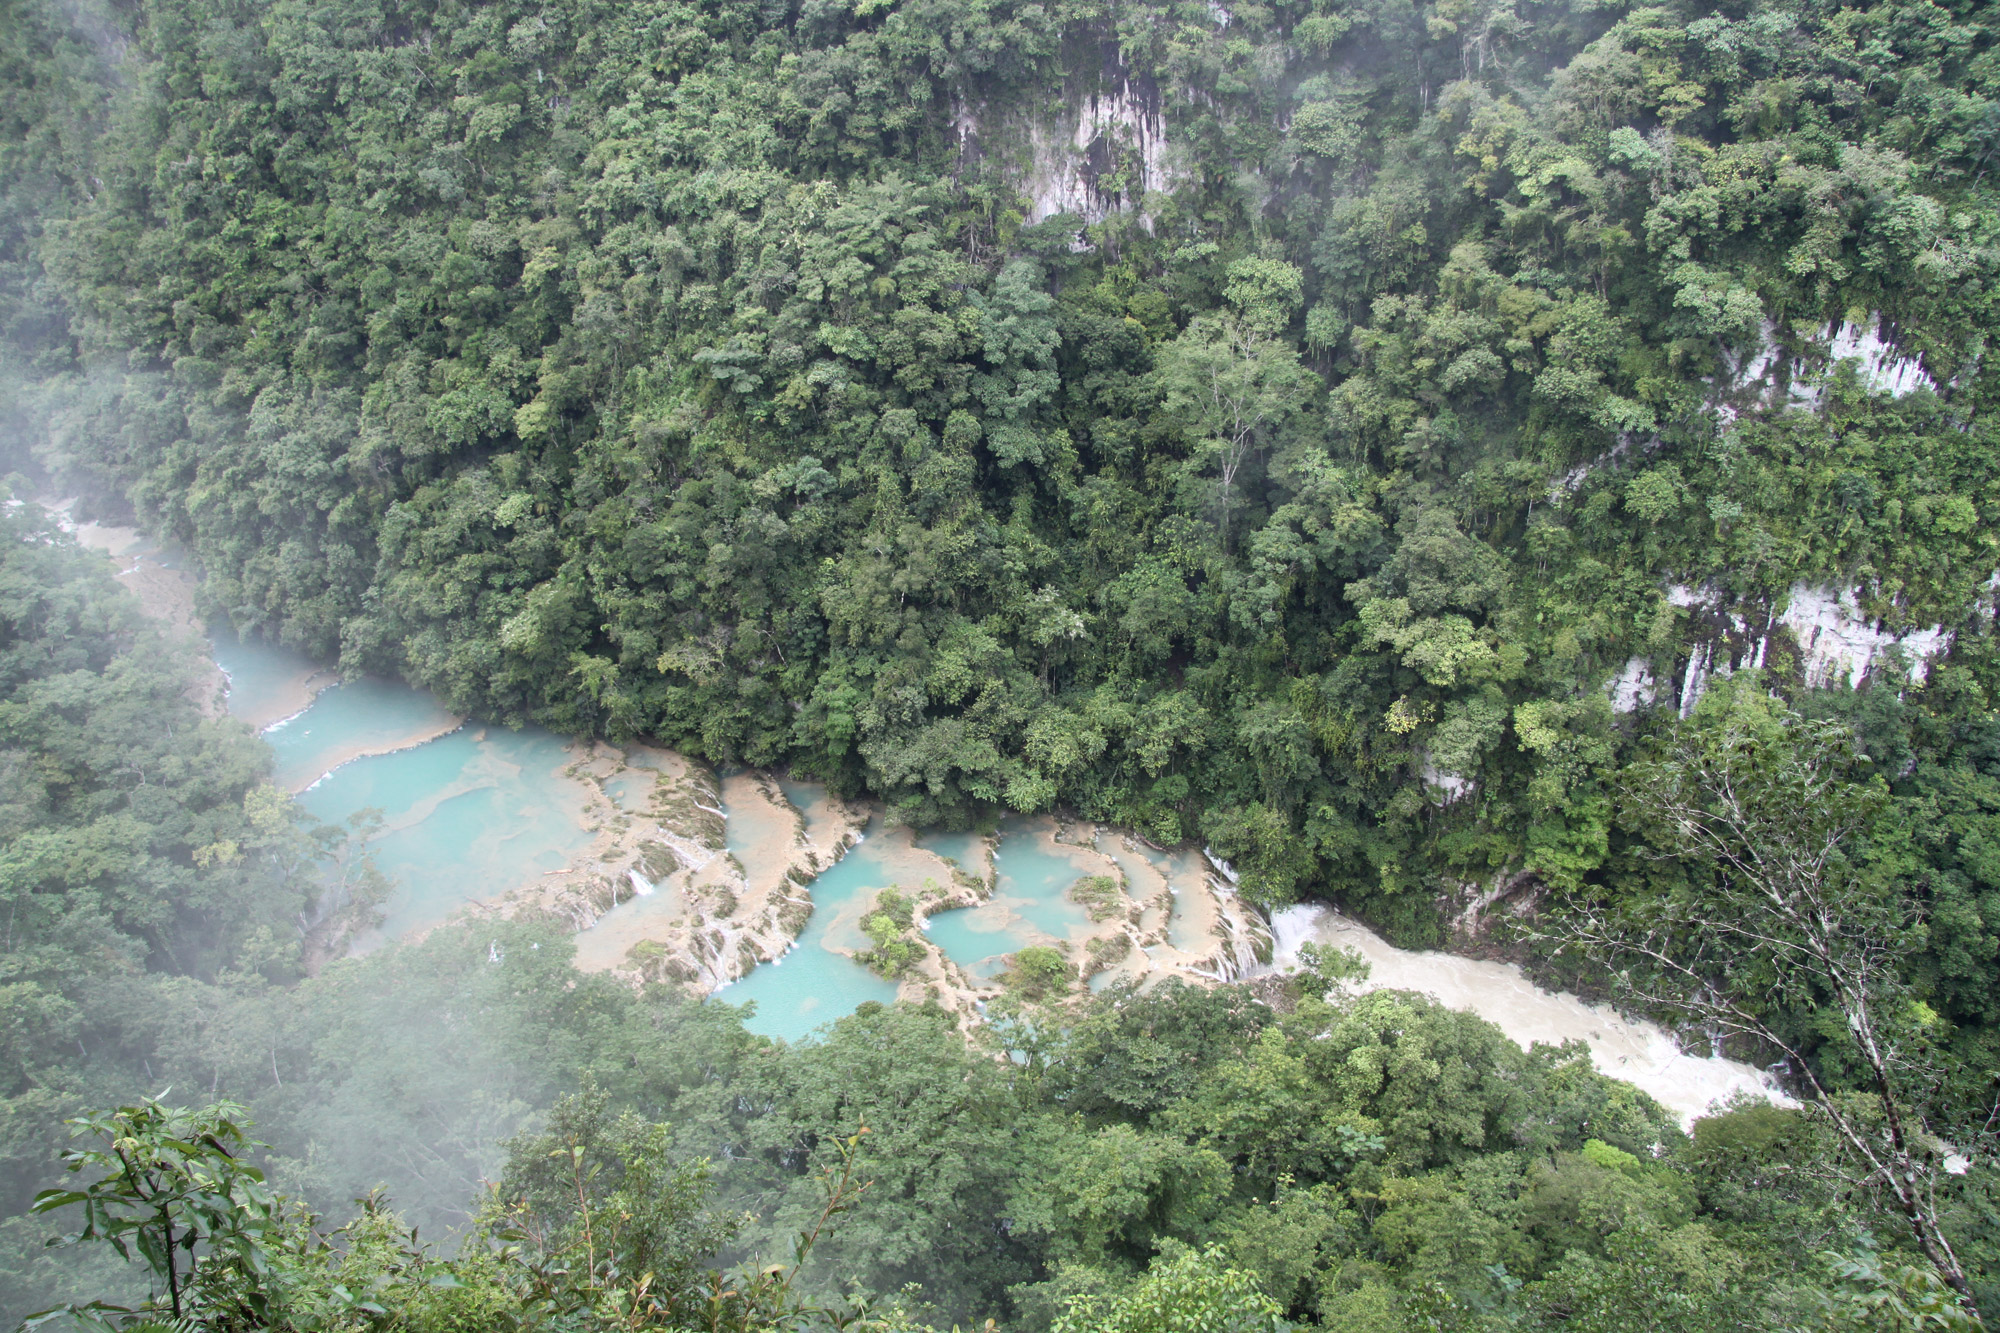 Guatemala 2015 - dag 11 - Uitzicht op Semuc Champey